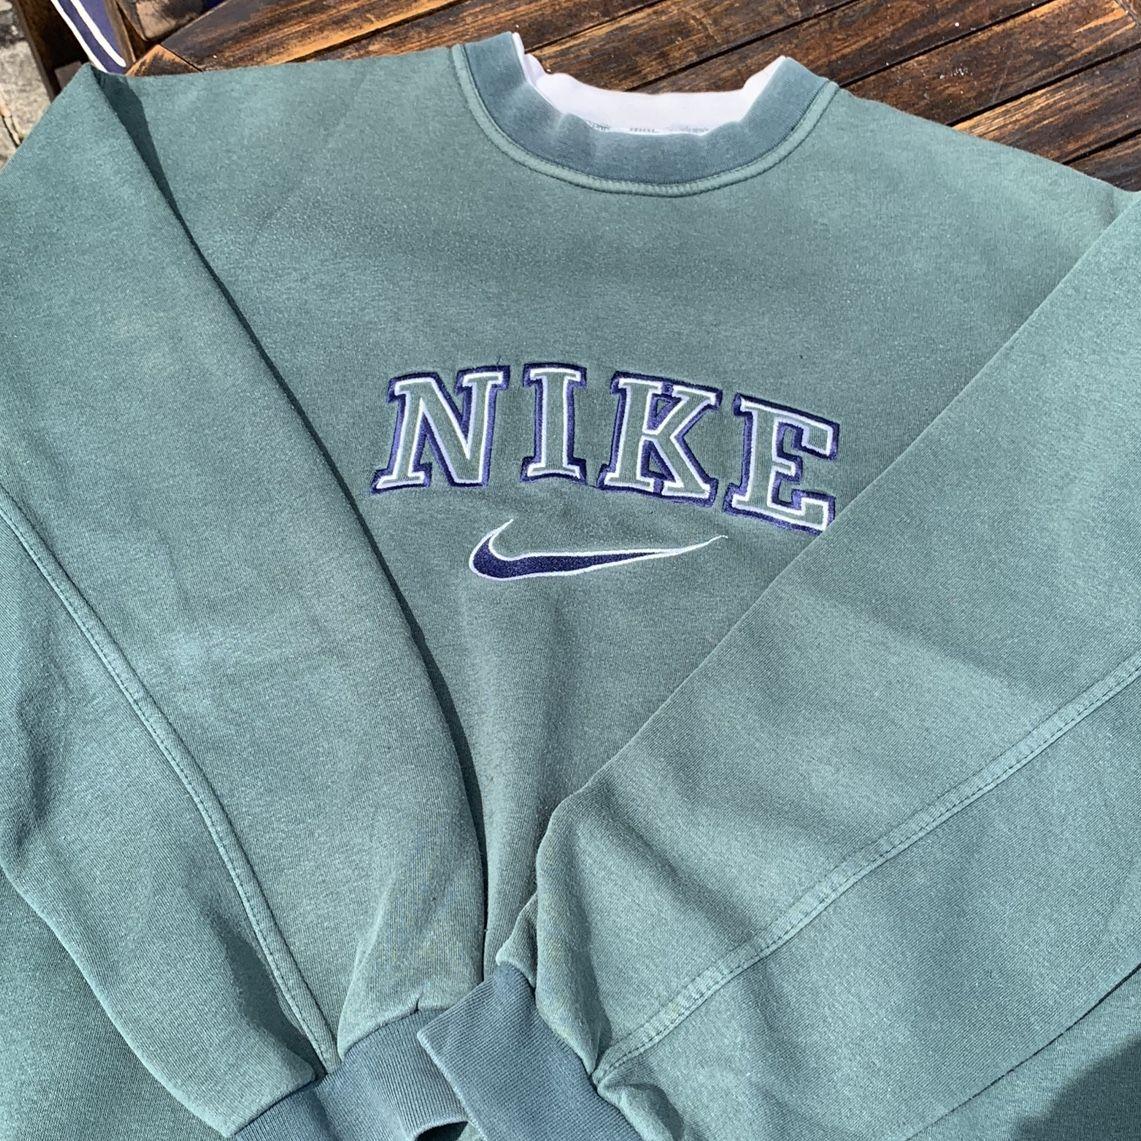 Vintage Forest Green Nike Crewneck Sweatshirt 90 S Fashion Vintage Nike Sweatshirt Vintage Crewneck Sweatshirt Trendy Sweatshirt [ 1141 x 1141 Pixel ]